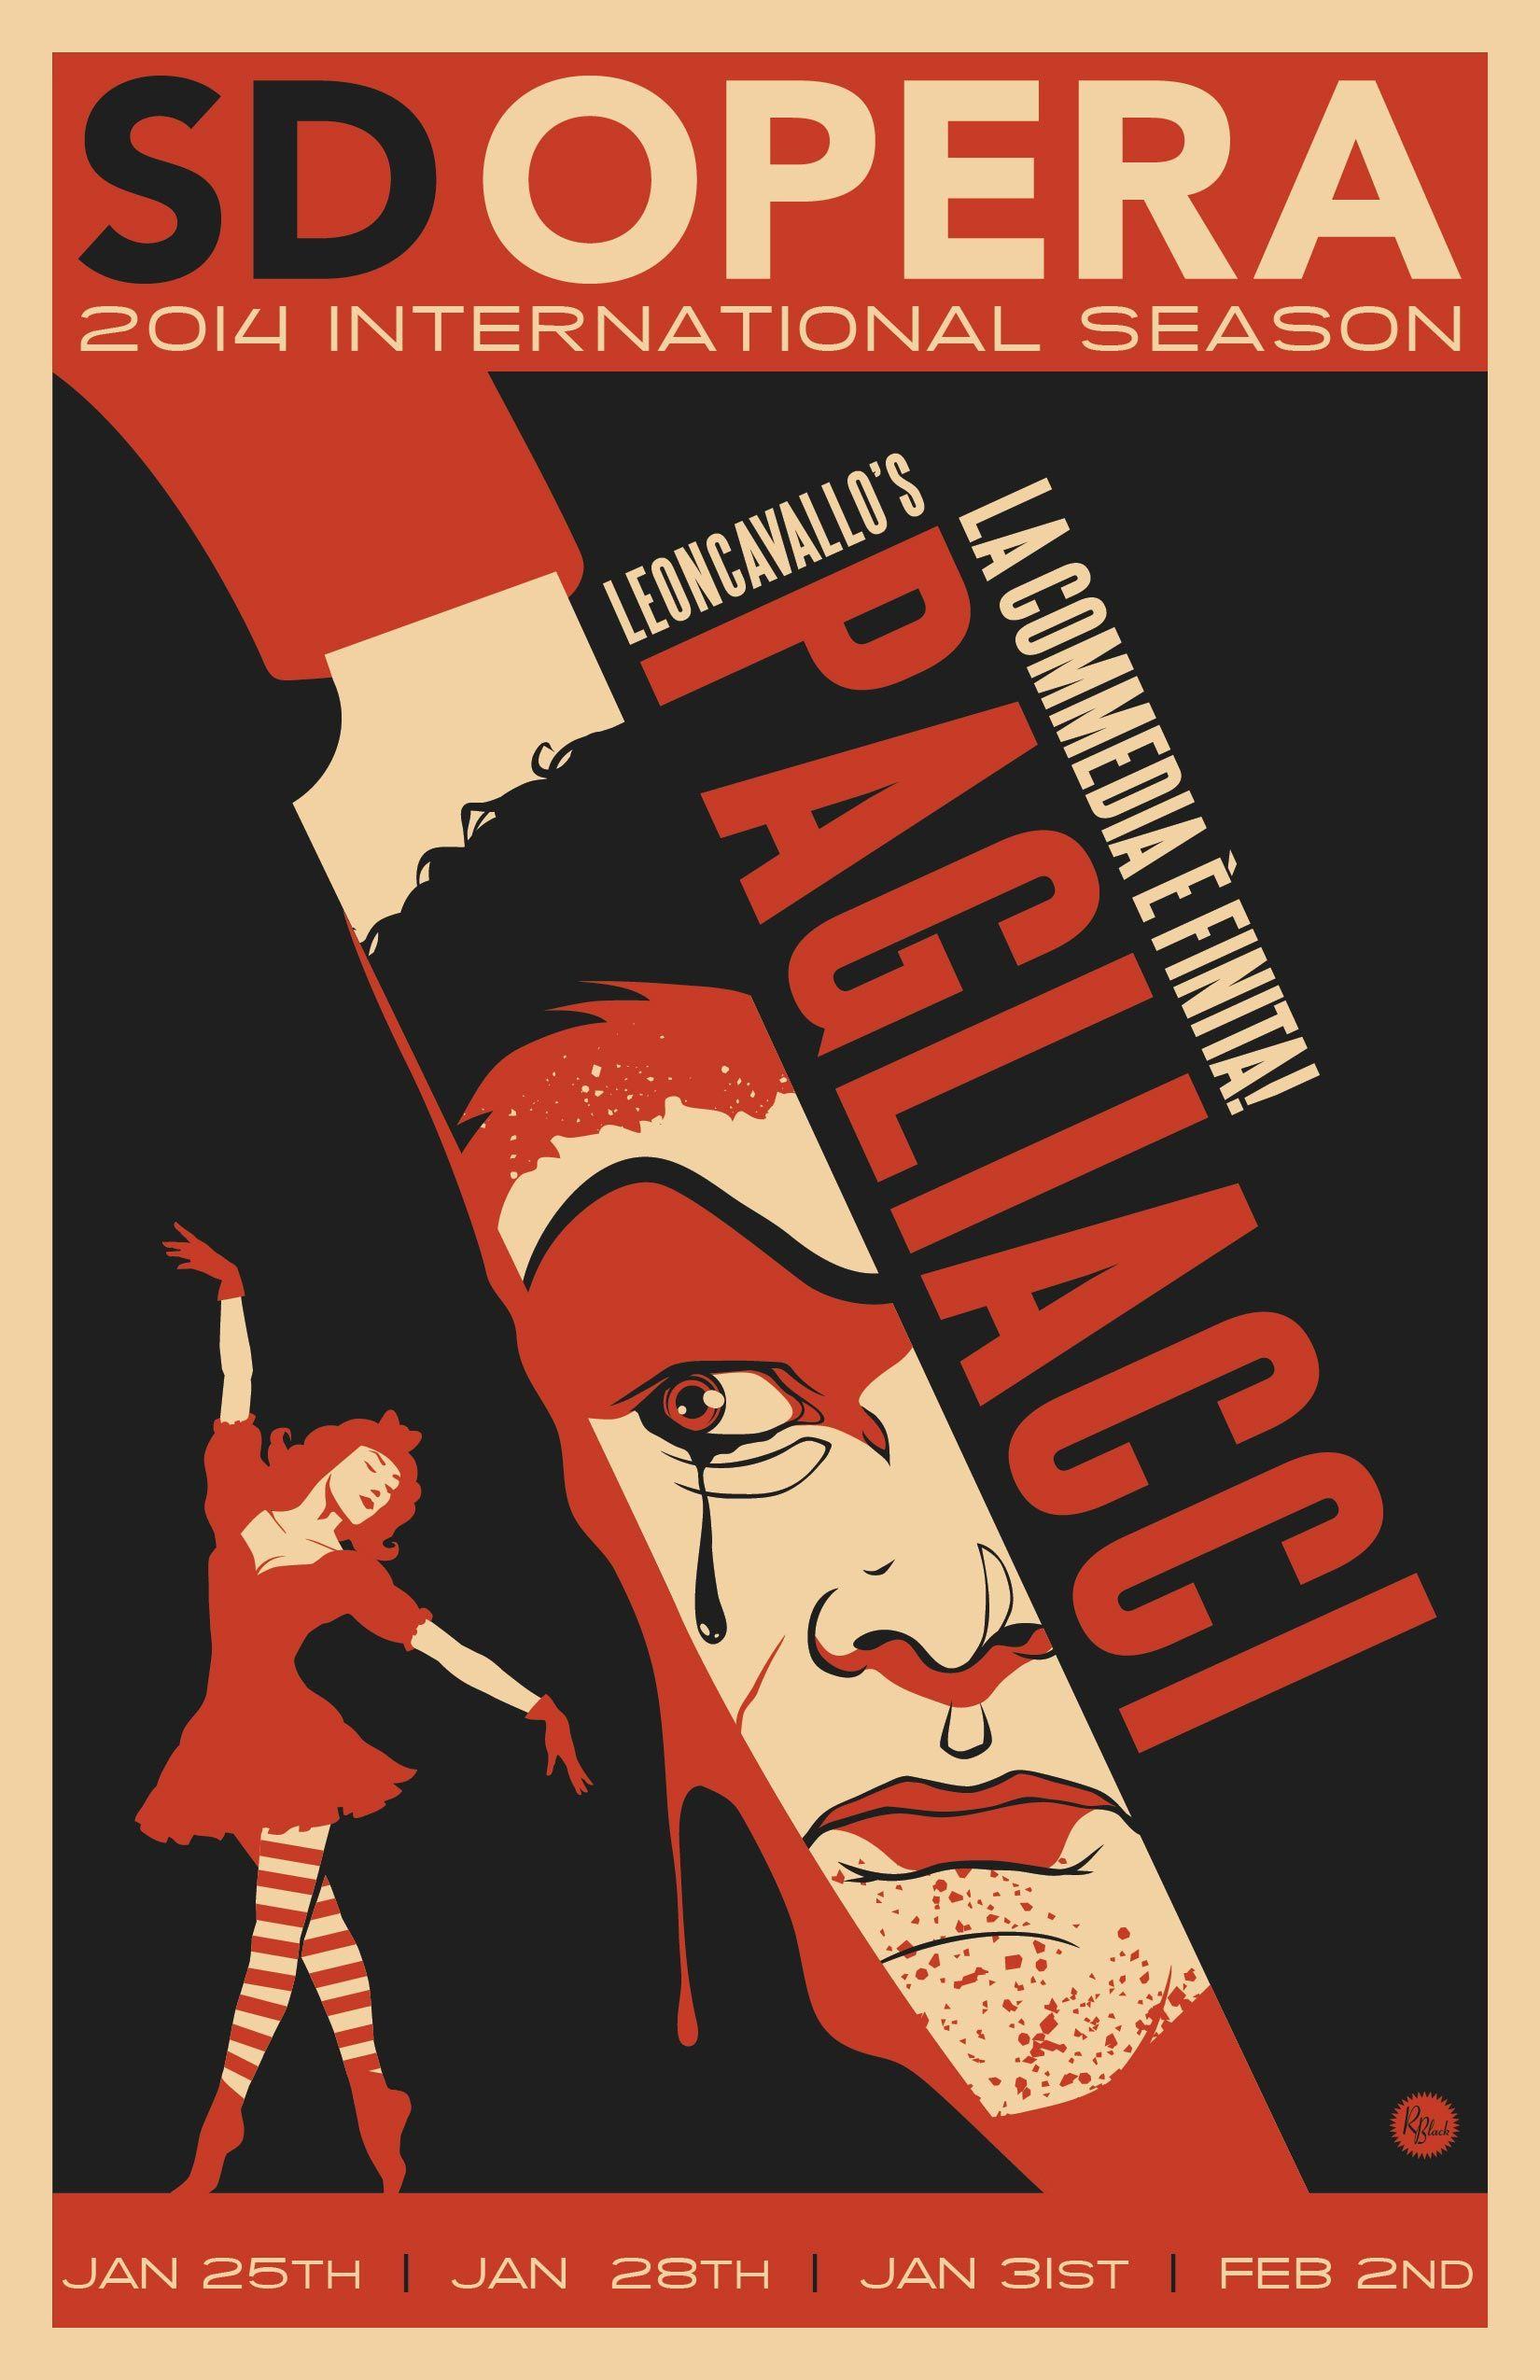 Leoncavallo's Pagliacci poster from the San Diego Opera